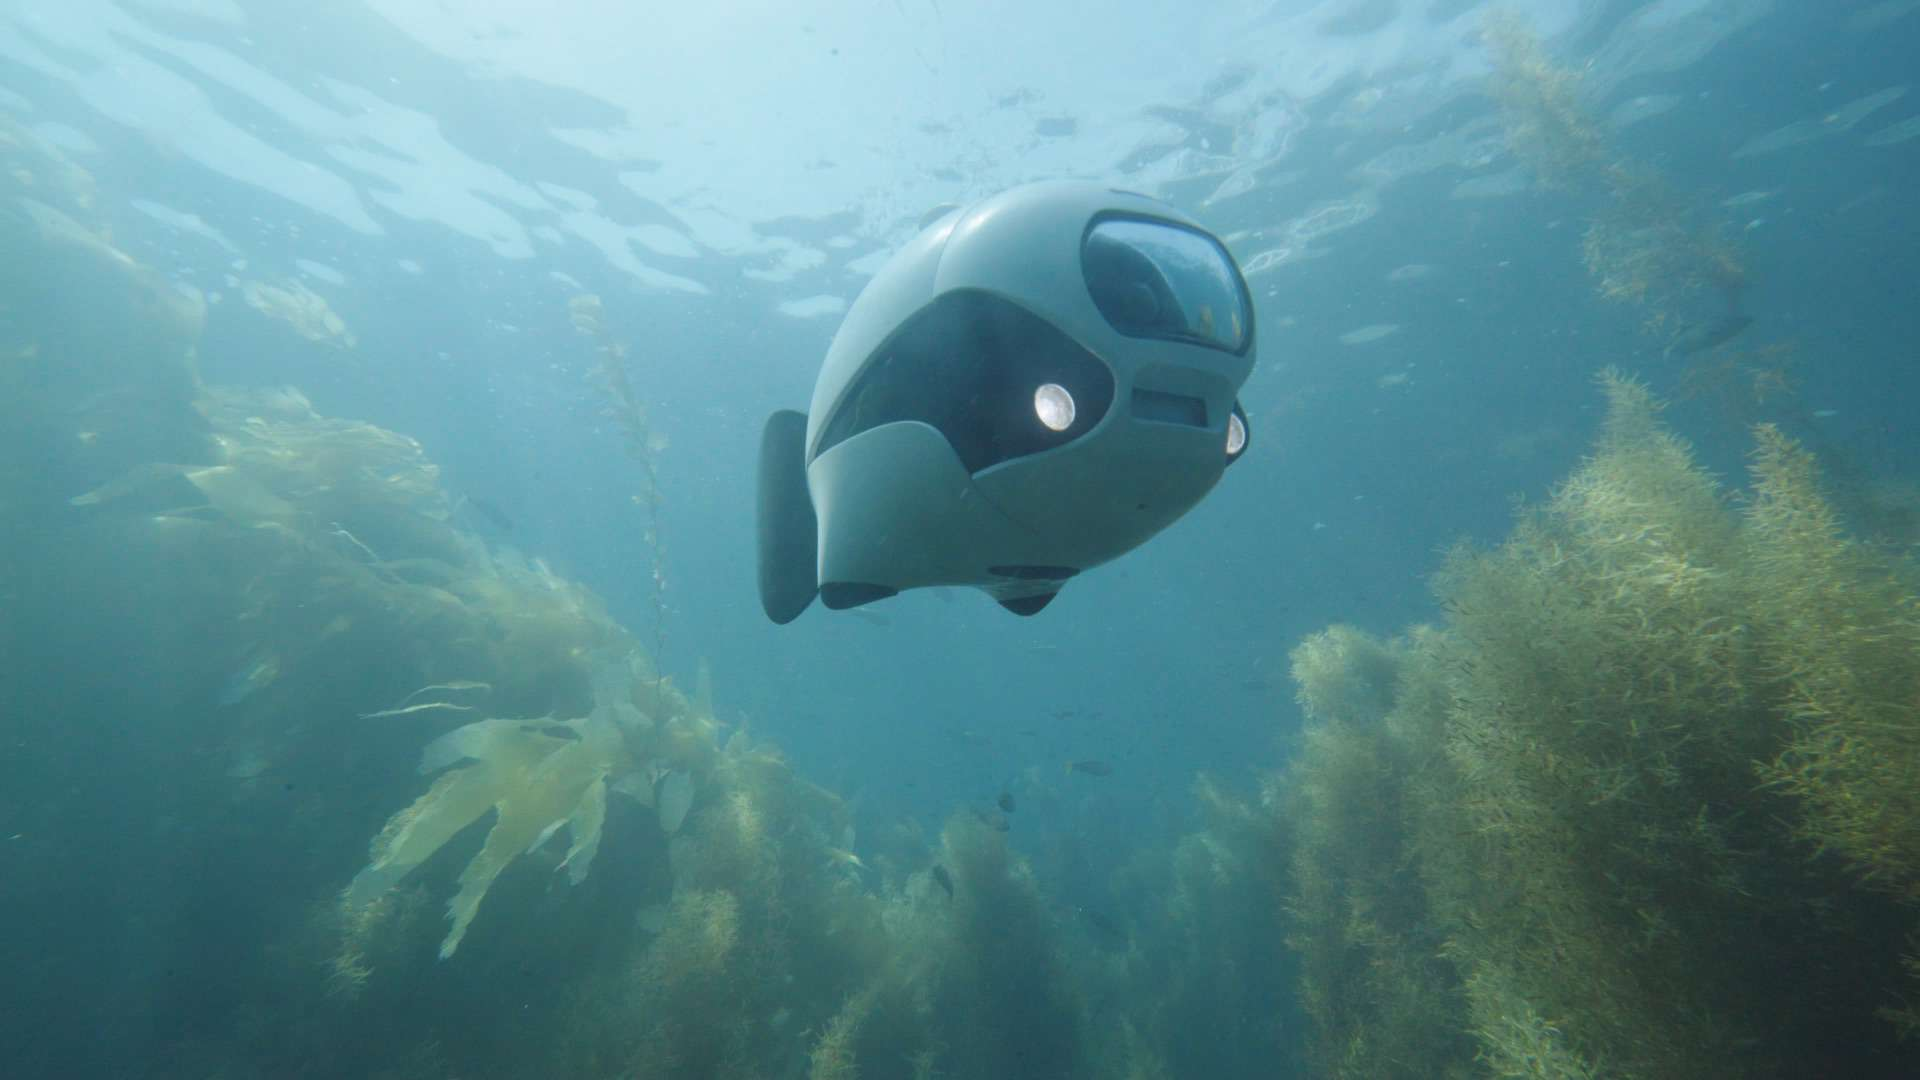 BIKI Bionic Wireless Underwater Fish Drone 5